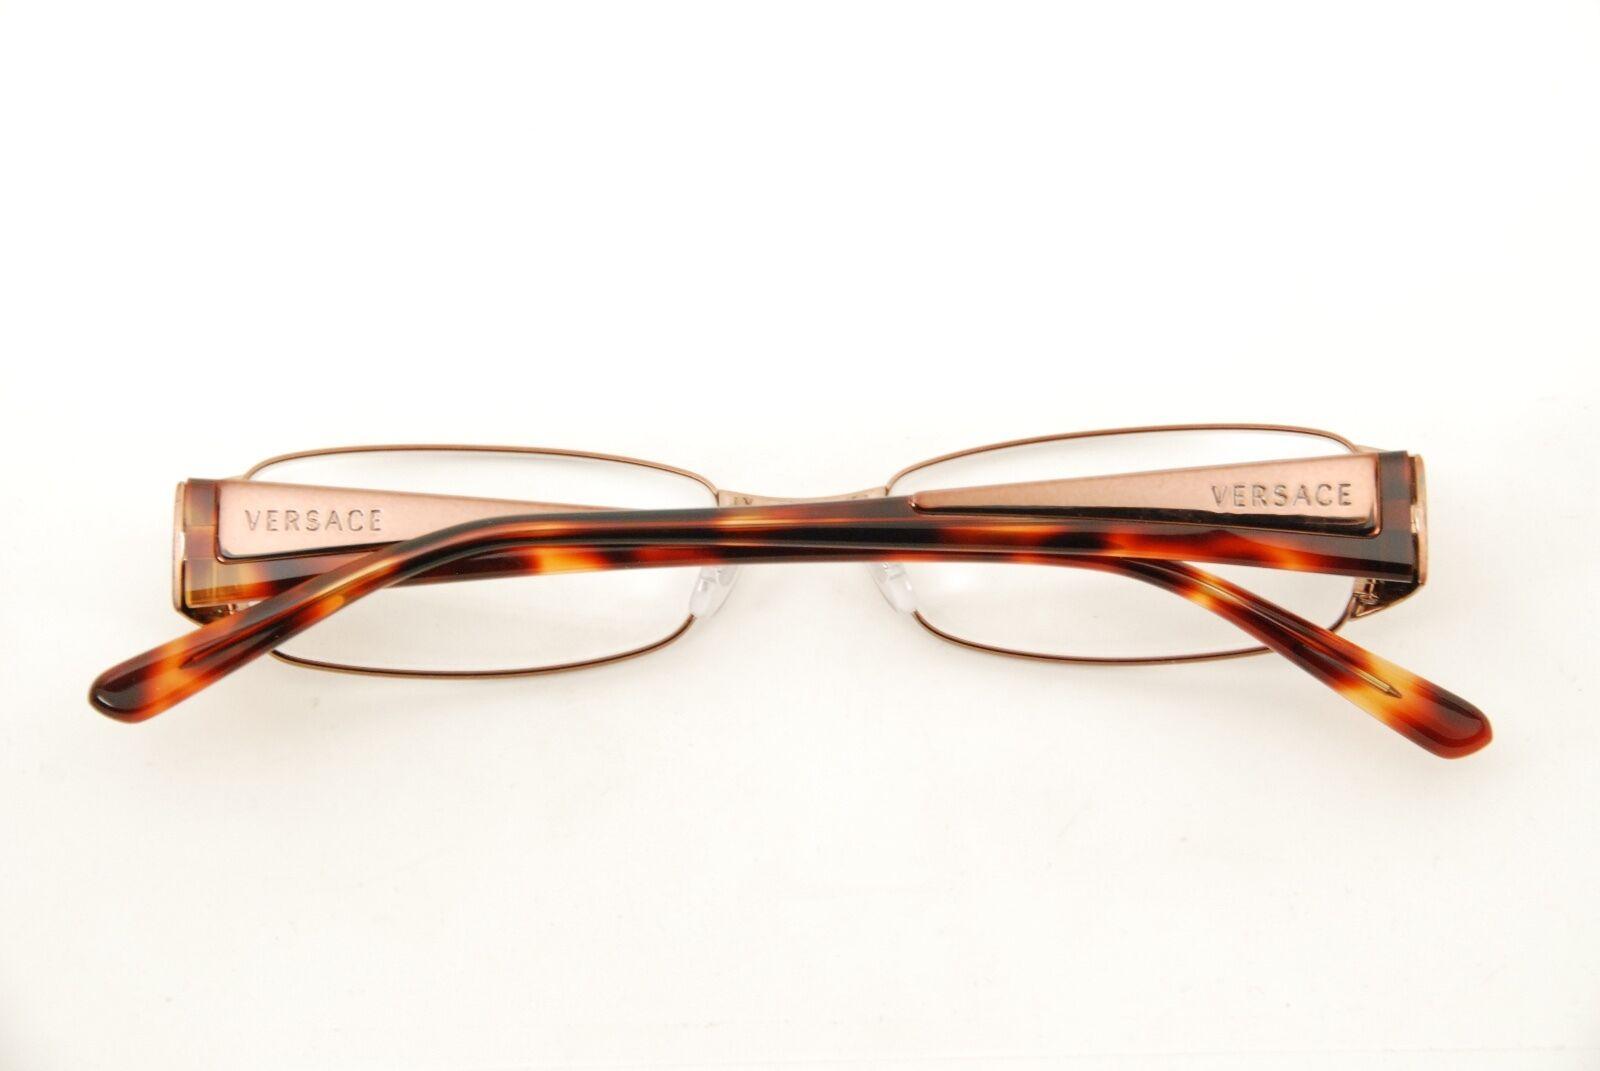 eed0f5c06e06 Authentic Versace Mod 1084 1045 Bronze havana 50mm Eyeglasses RX Italy for  sale online